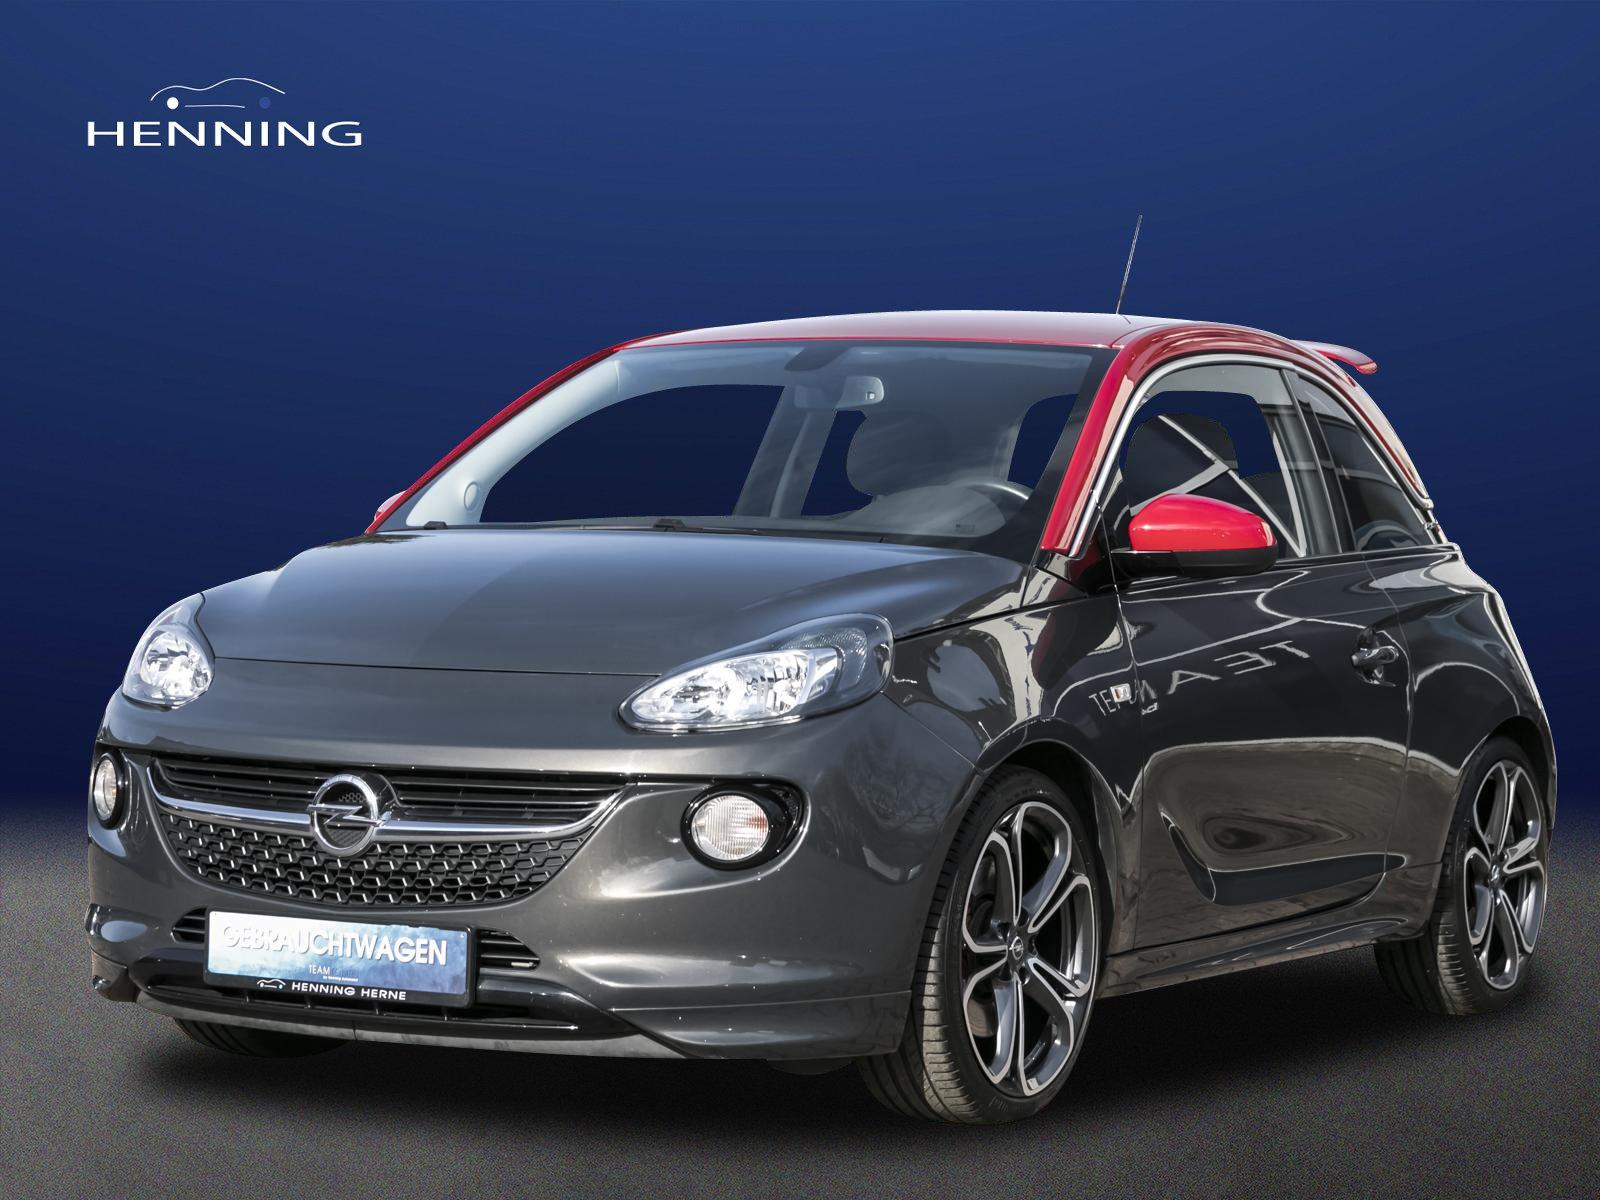 Opel Adam 1.4 Turbo S *18Zoll*IntelliLink*Winterpaket, Jahr 2015, Benzin